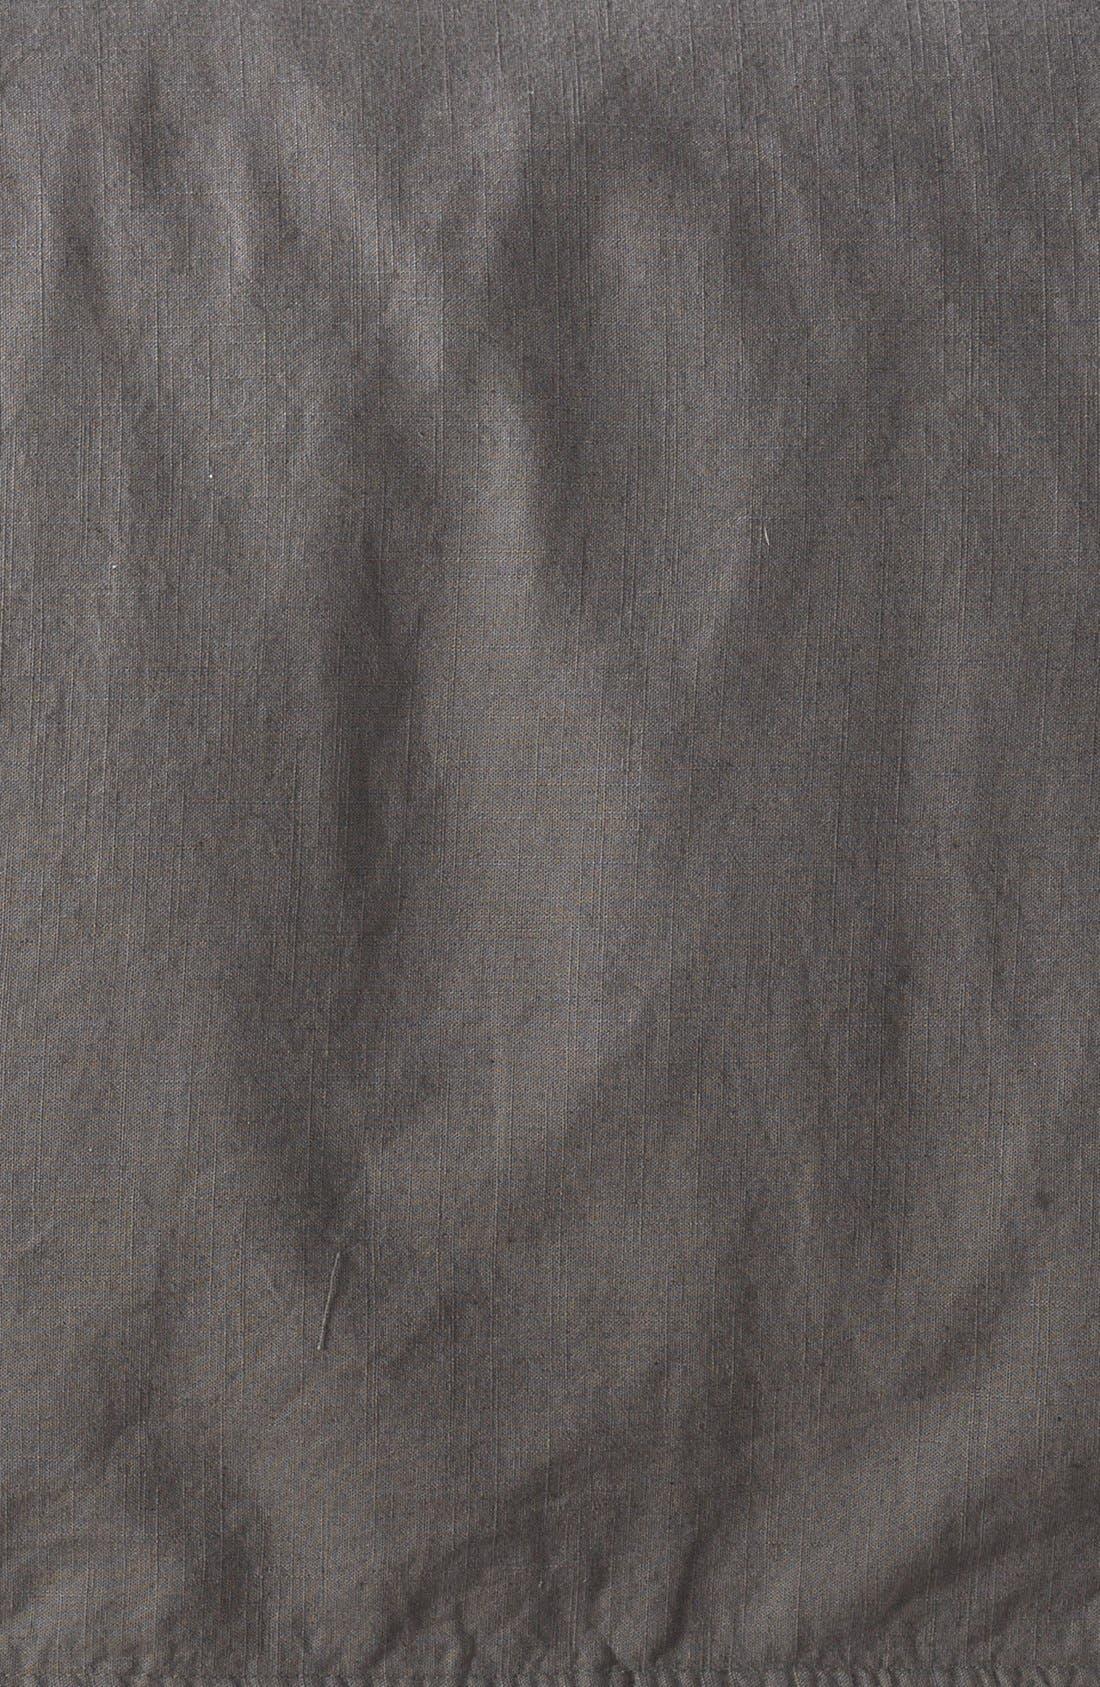 NORDSTROM AT HOME, 'Terra' Cotton & Linen Duvet Cover, Alternate thumbnail 3, color, 021